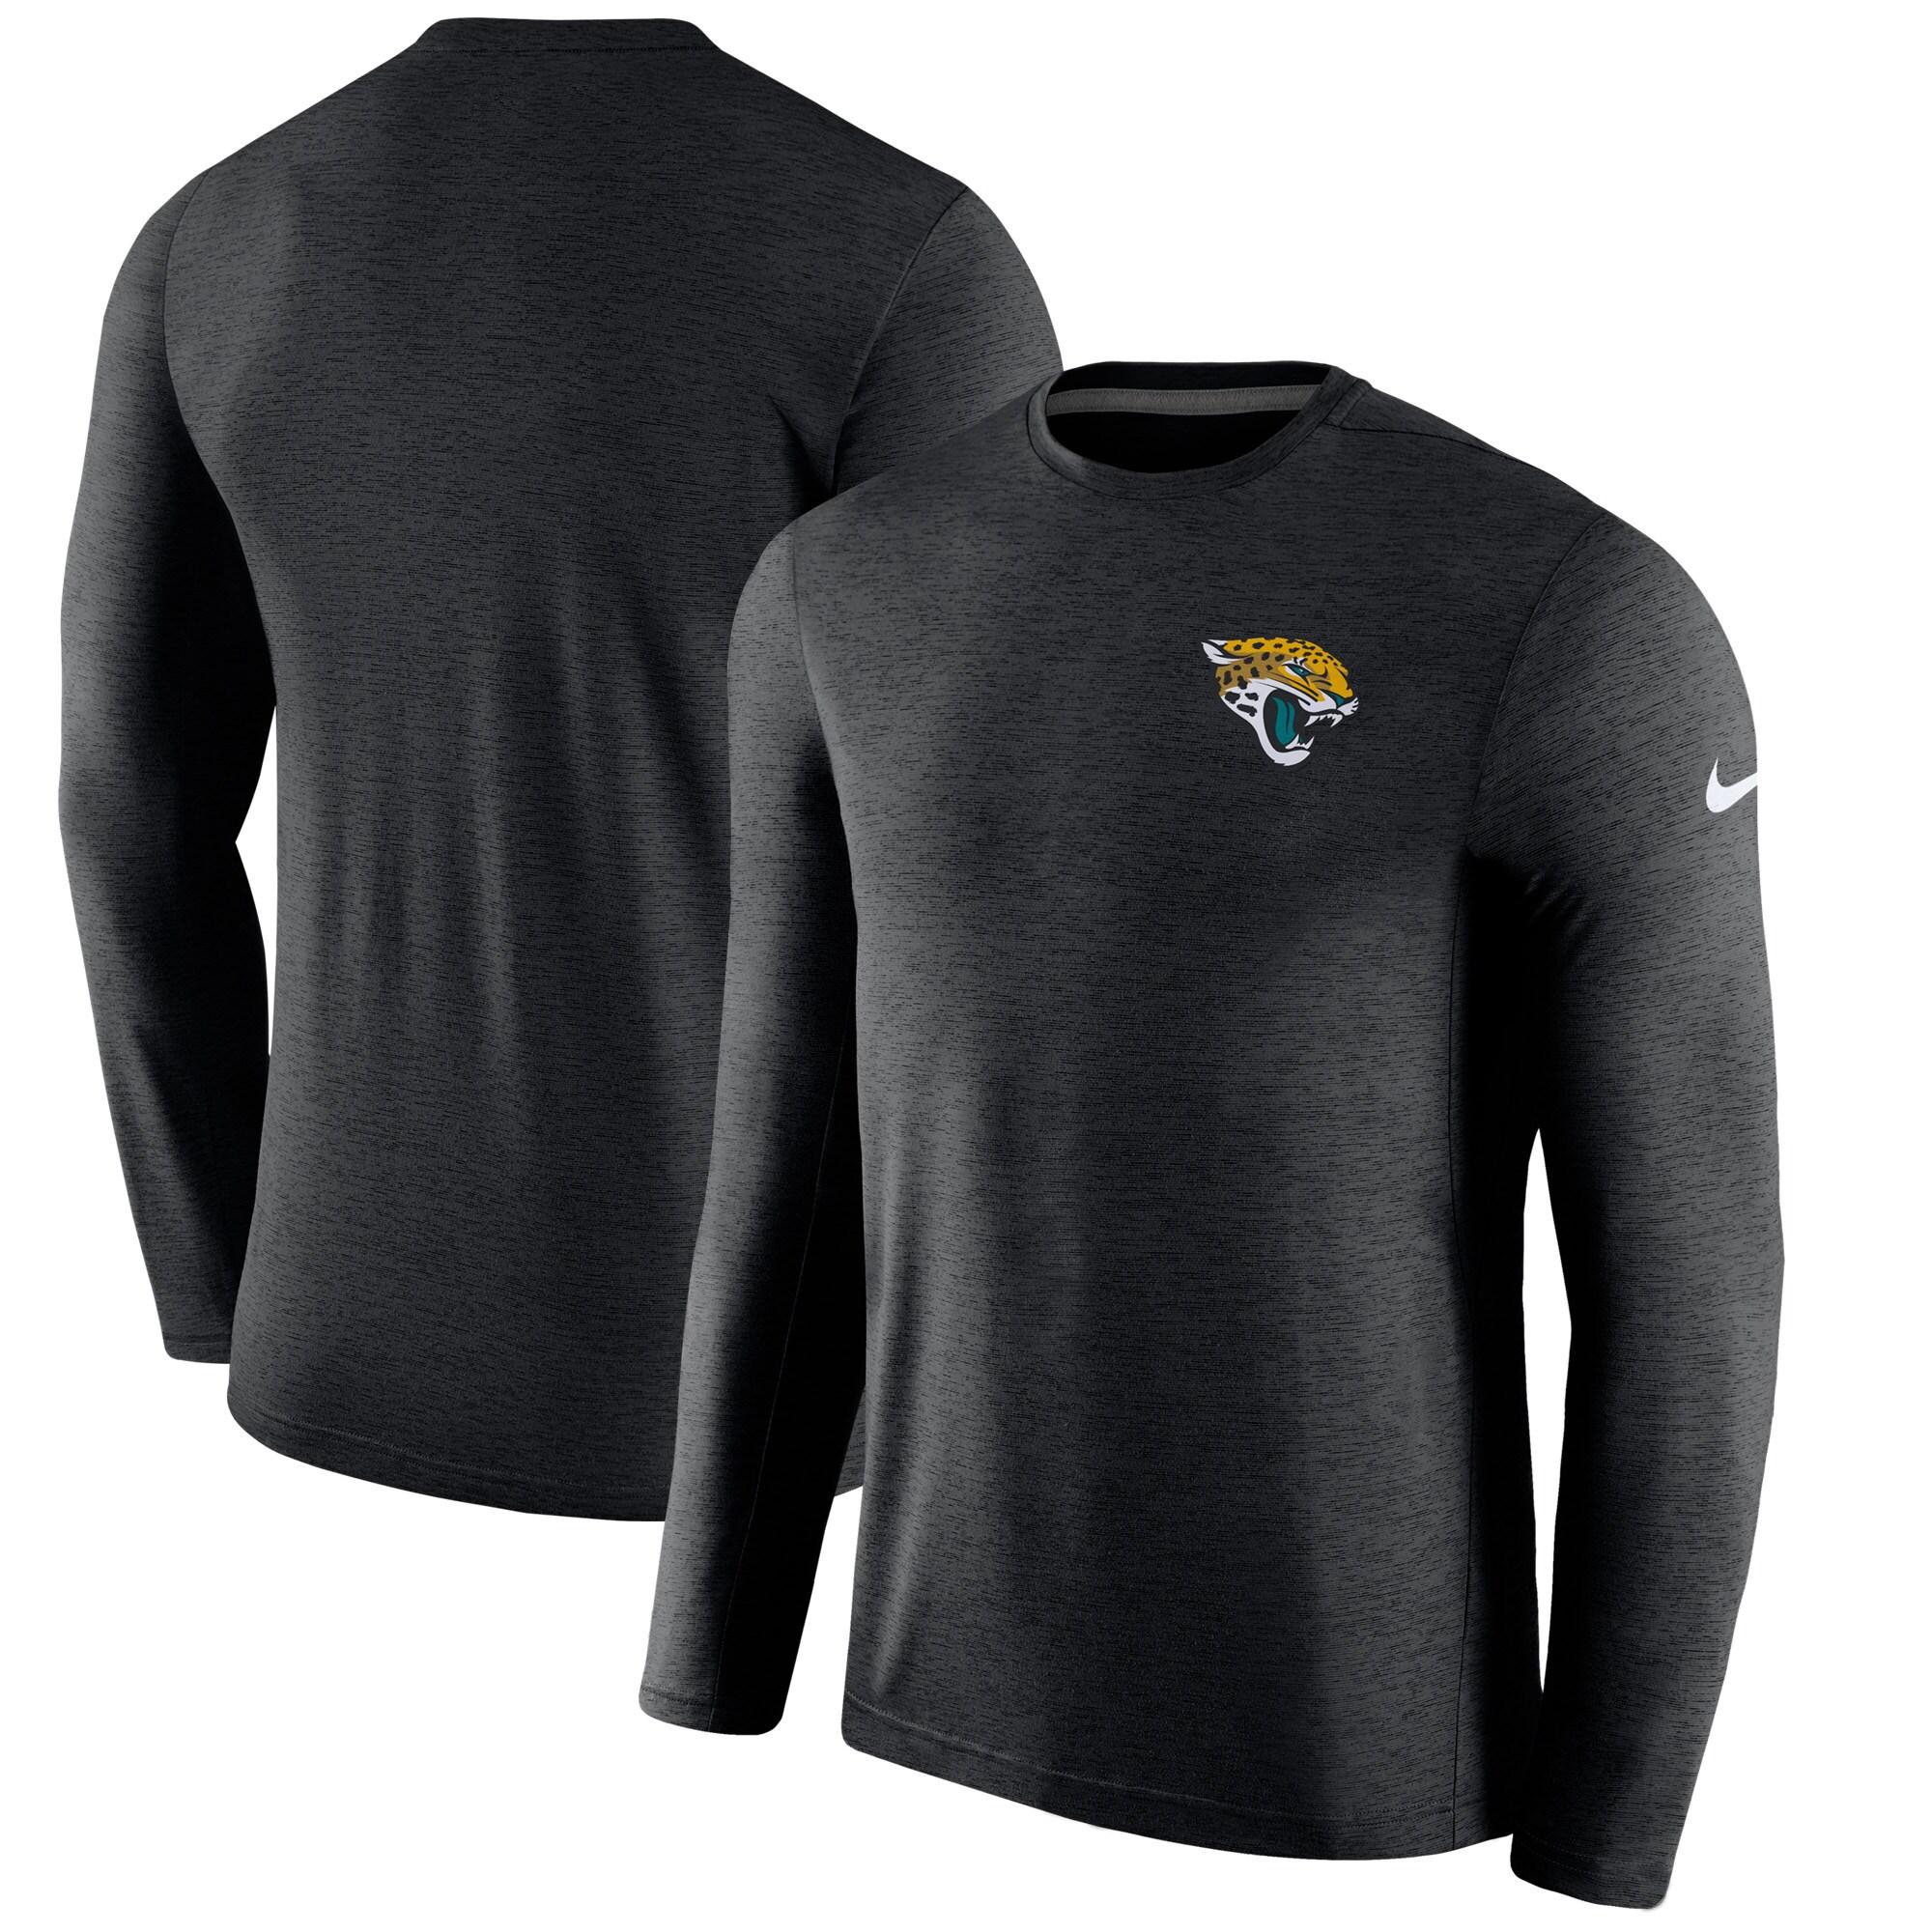 Jacksonville Jaguars Nike Sideline Coaches Long Sleeve Performance T-Shirt - Black